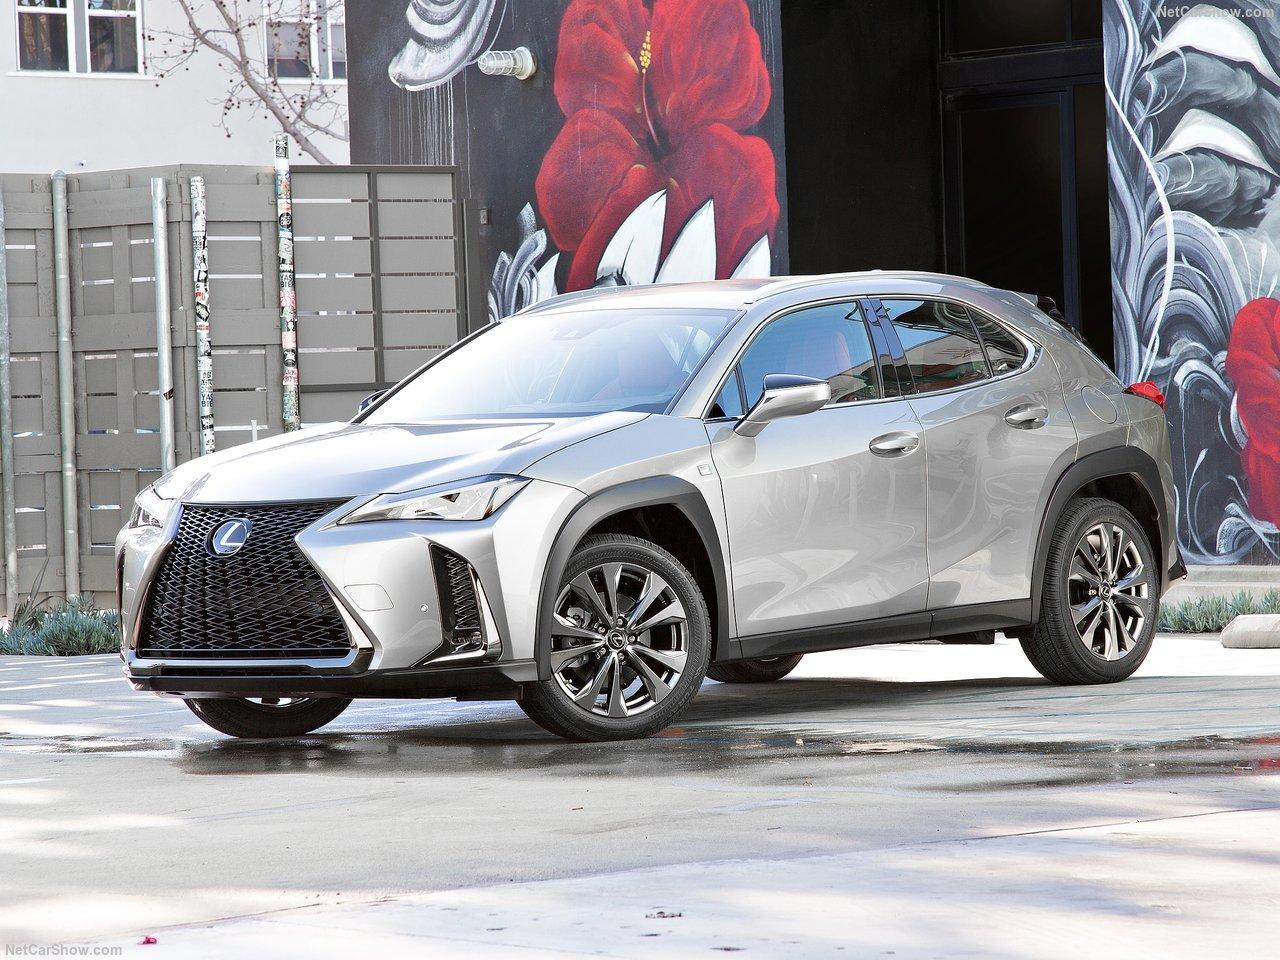 Lexus-UX-2019-1280-05.jpg